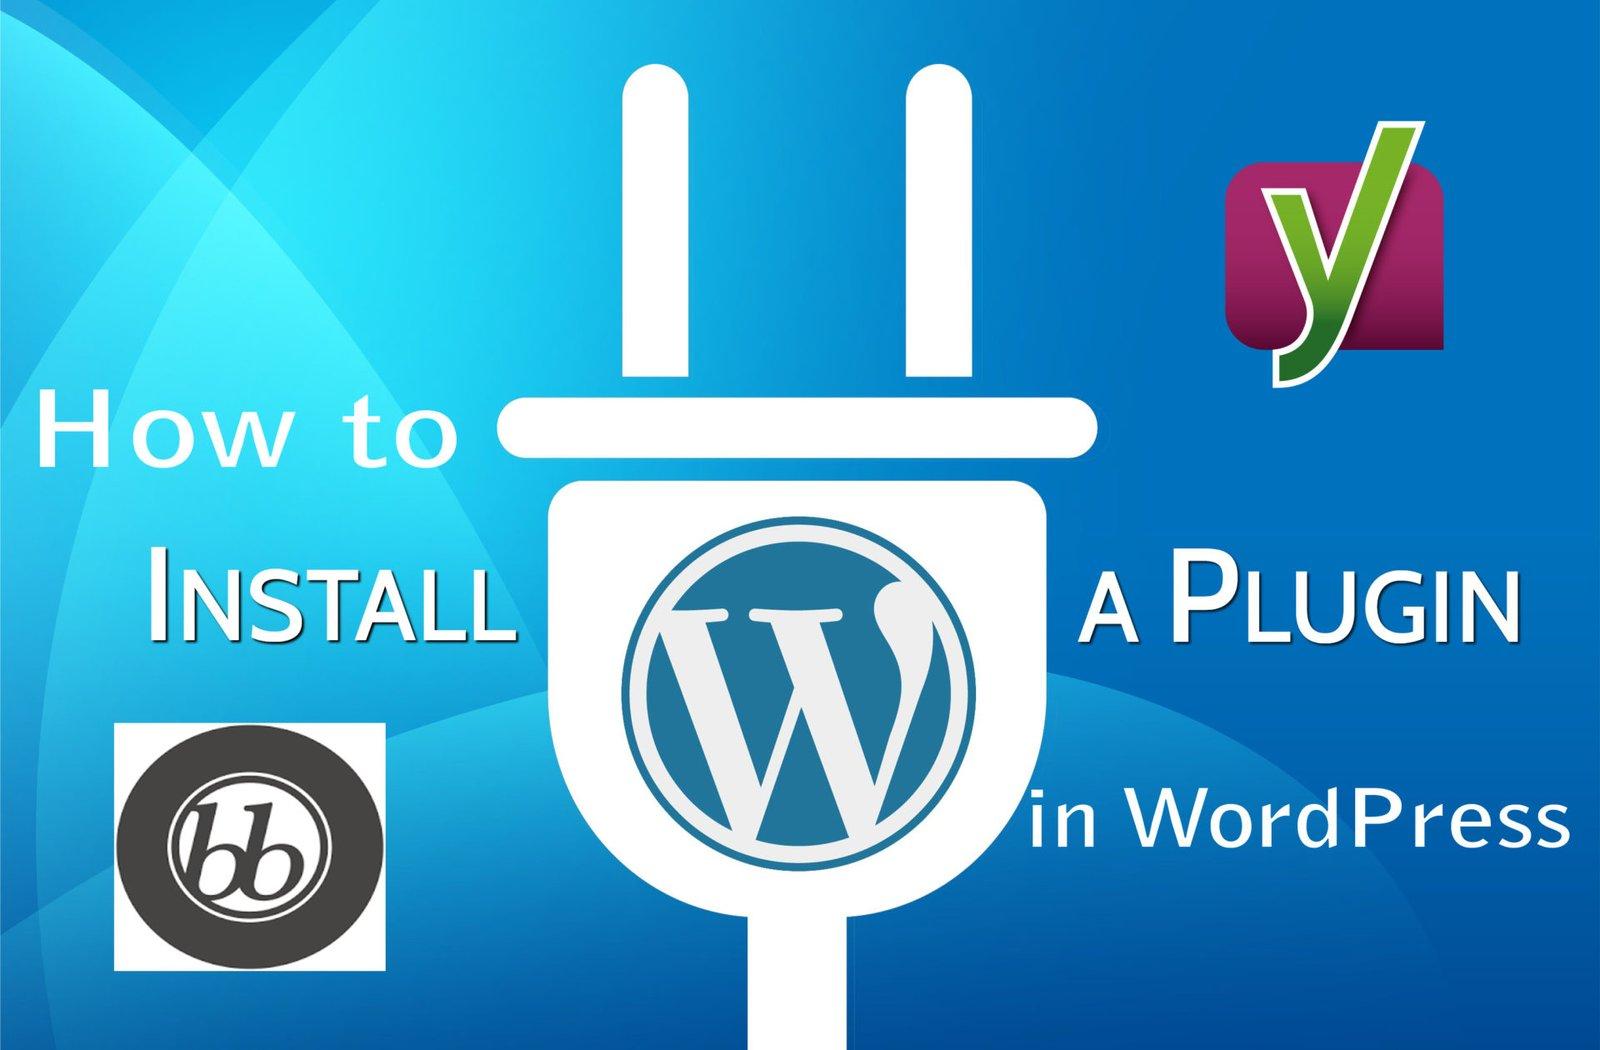 How-to-Install-Plugin-in-WordPress